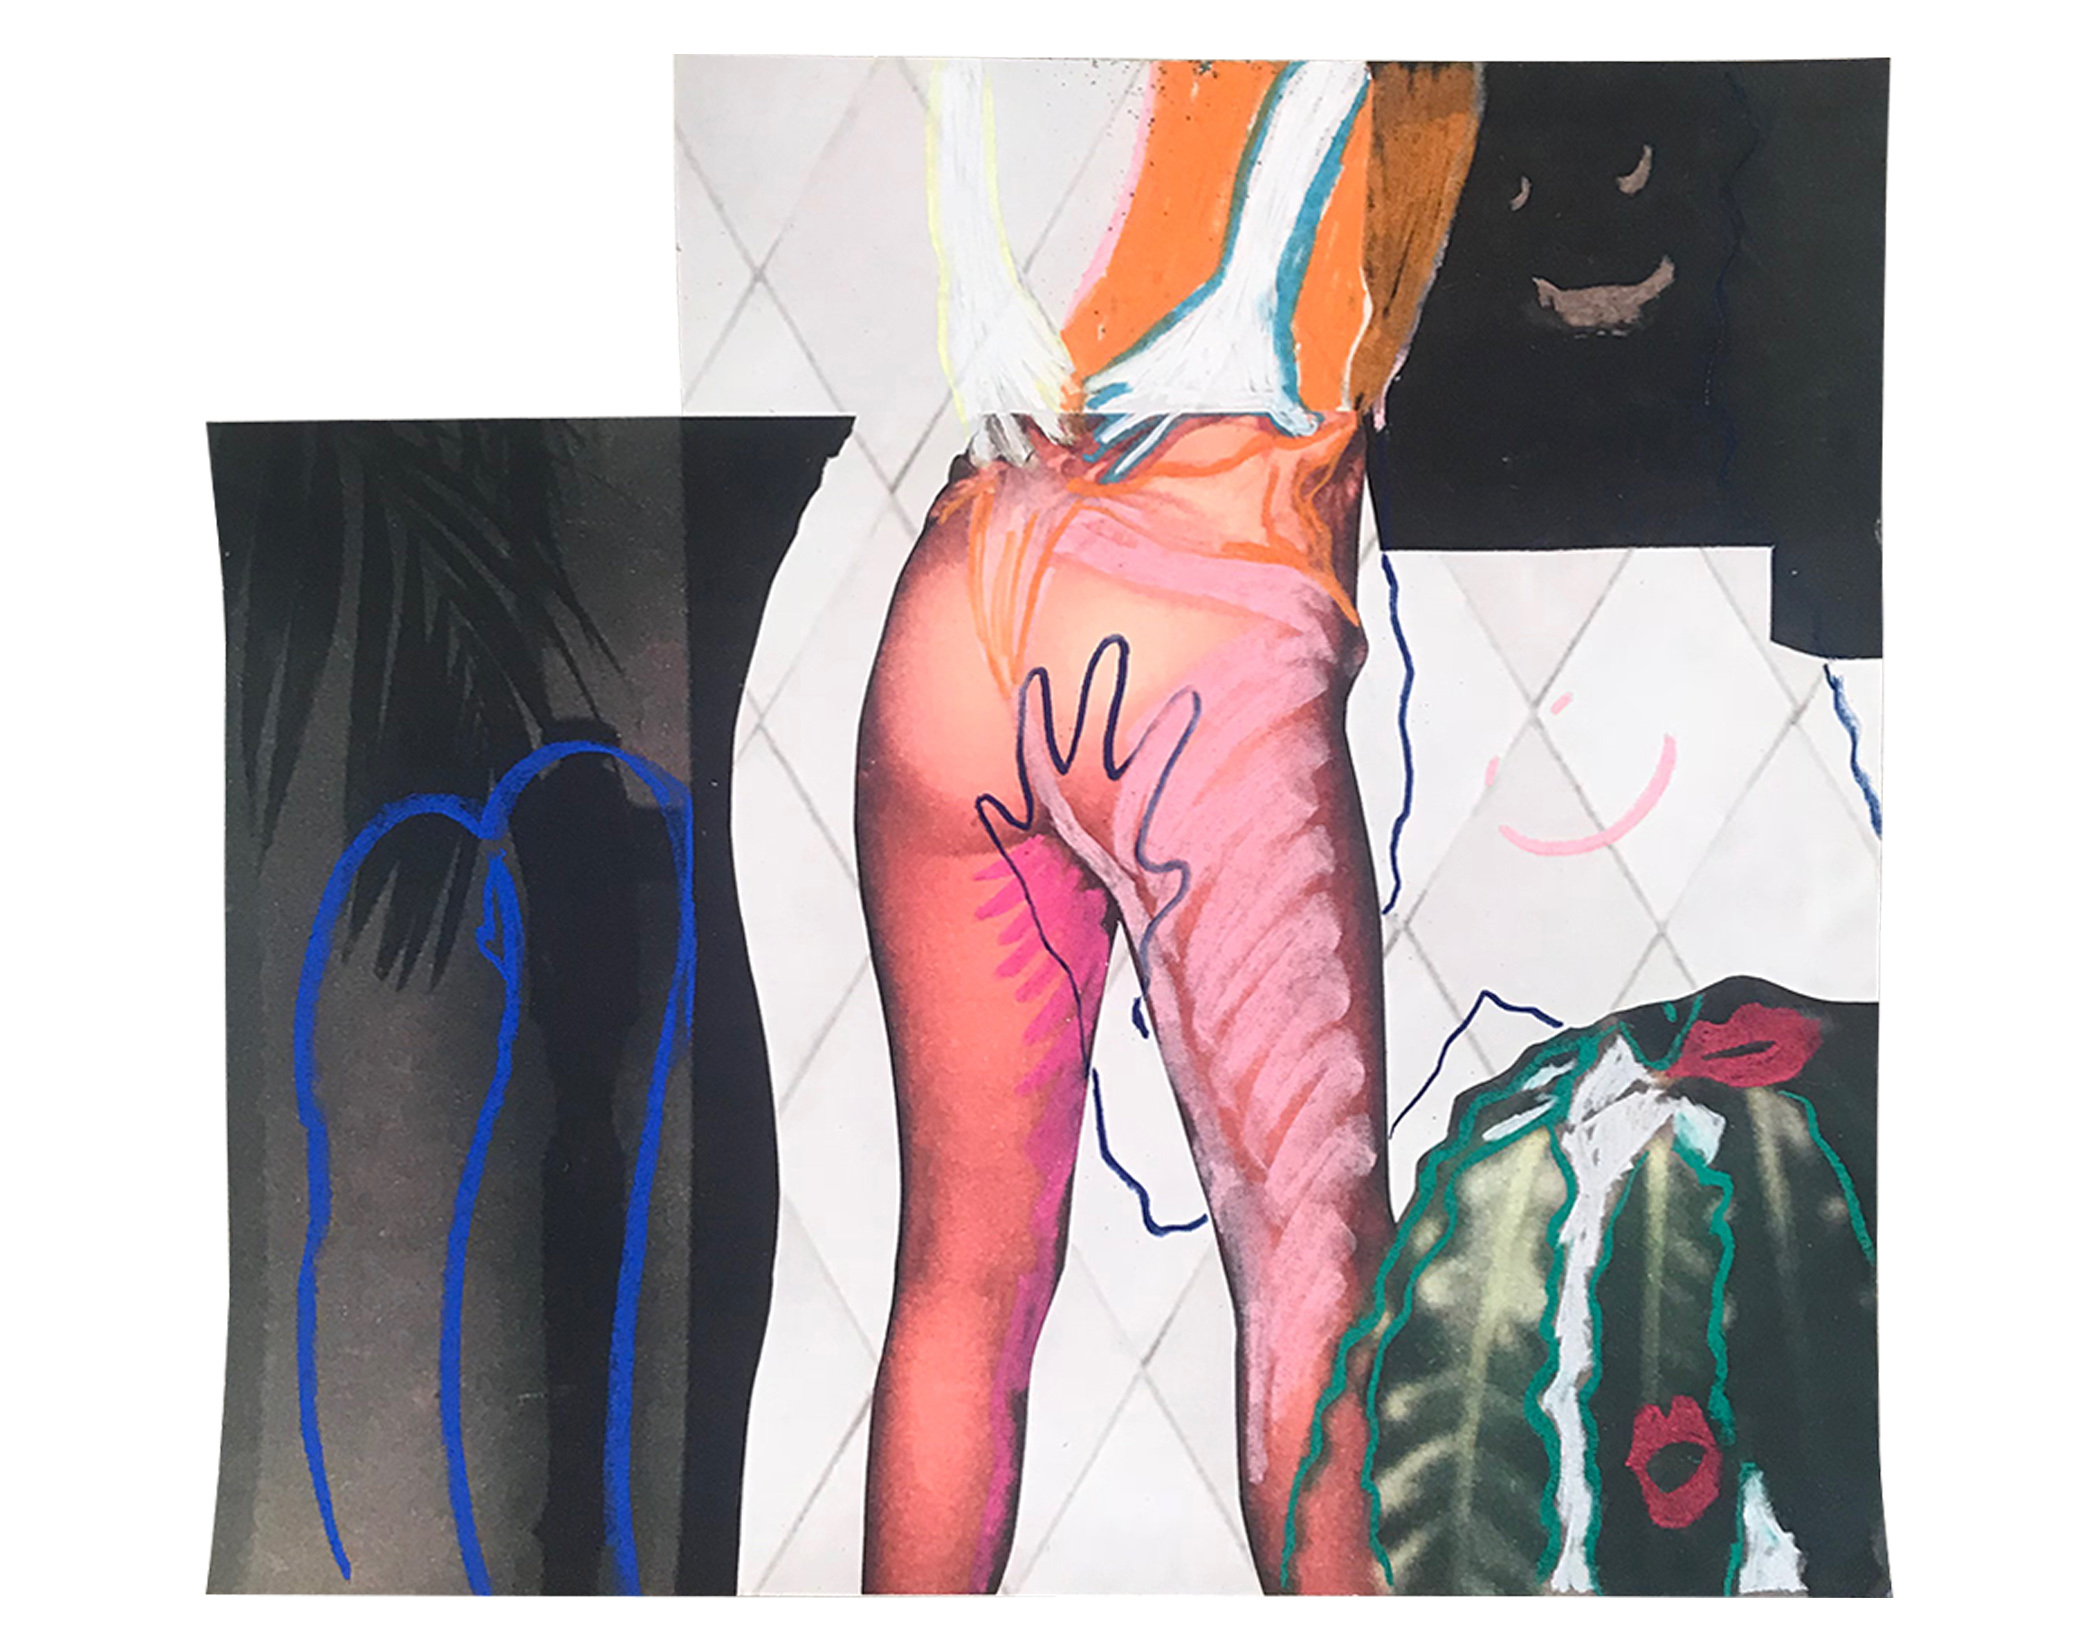 "DEVIANT PLEASURE 10"" x 12"" Chalk Pastel on Archival Inkjet Print $75.00    BUY"